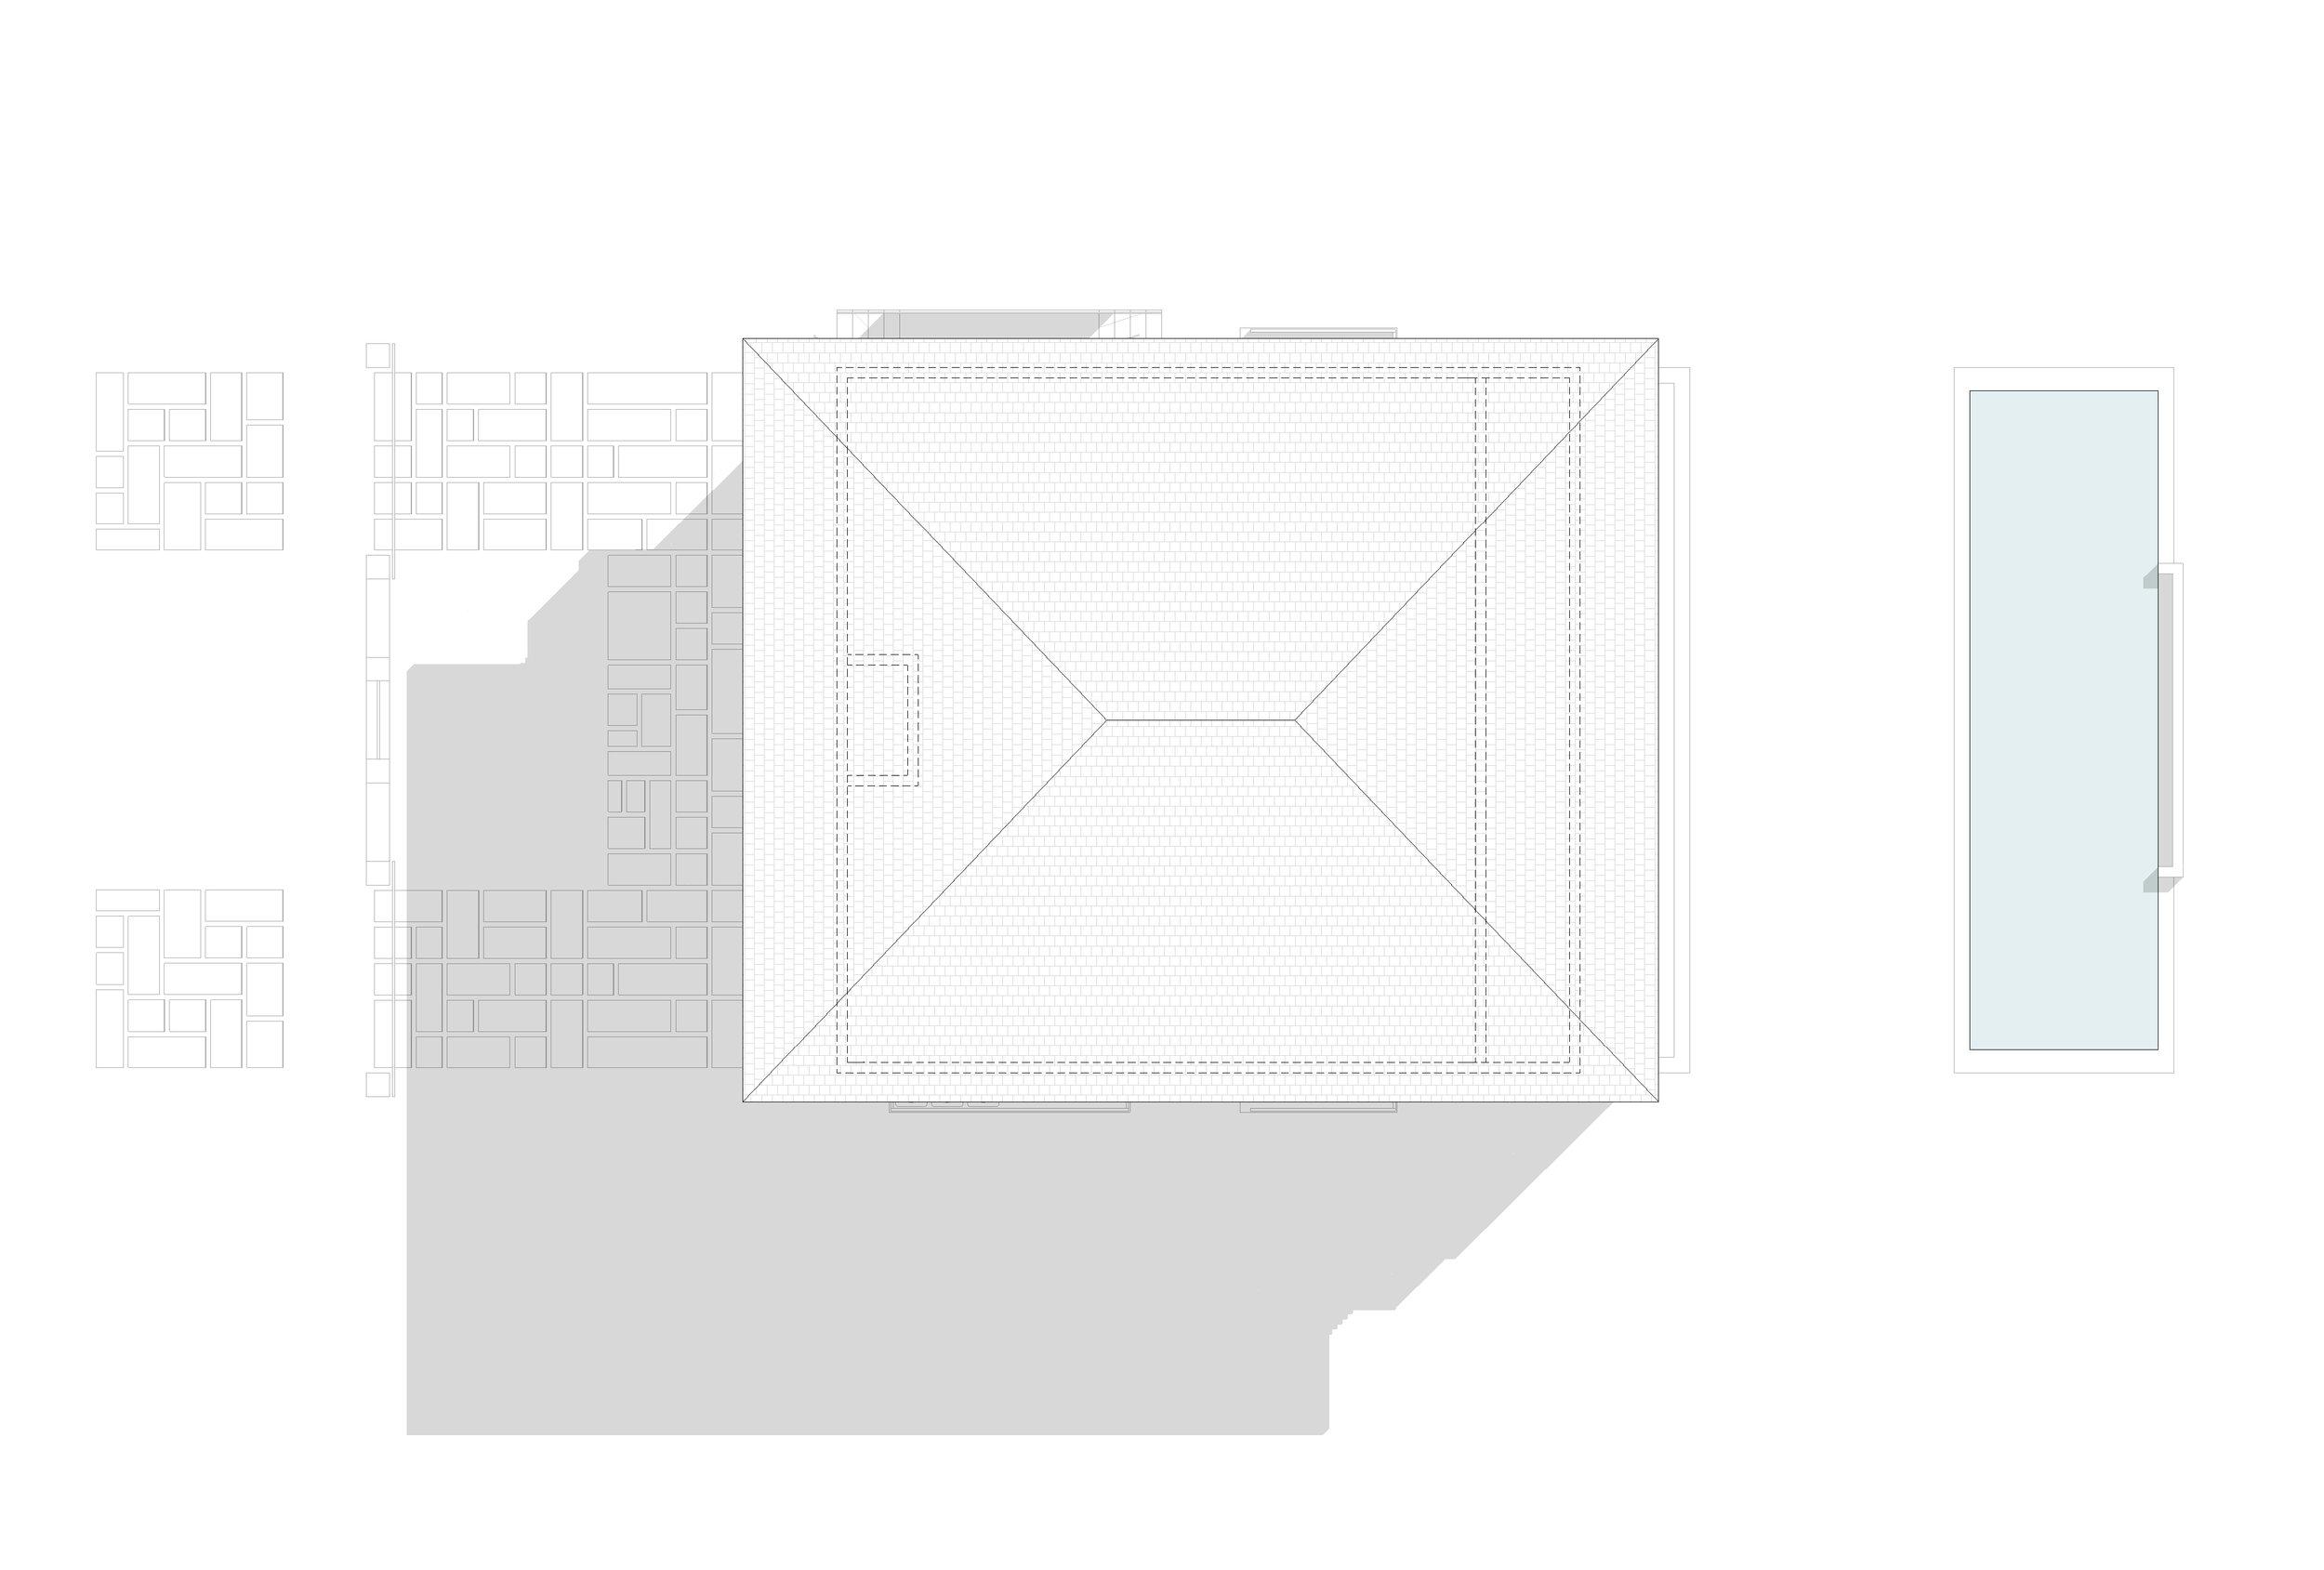 1804 BAYROAD - Sheet - X3 - Roof Plan.jpg